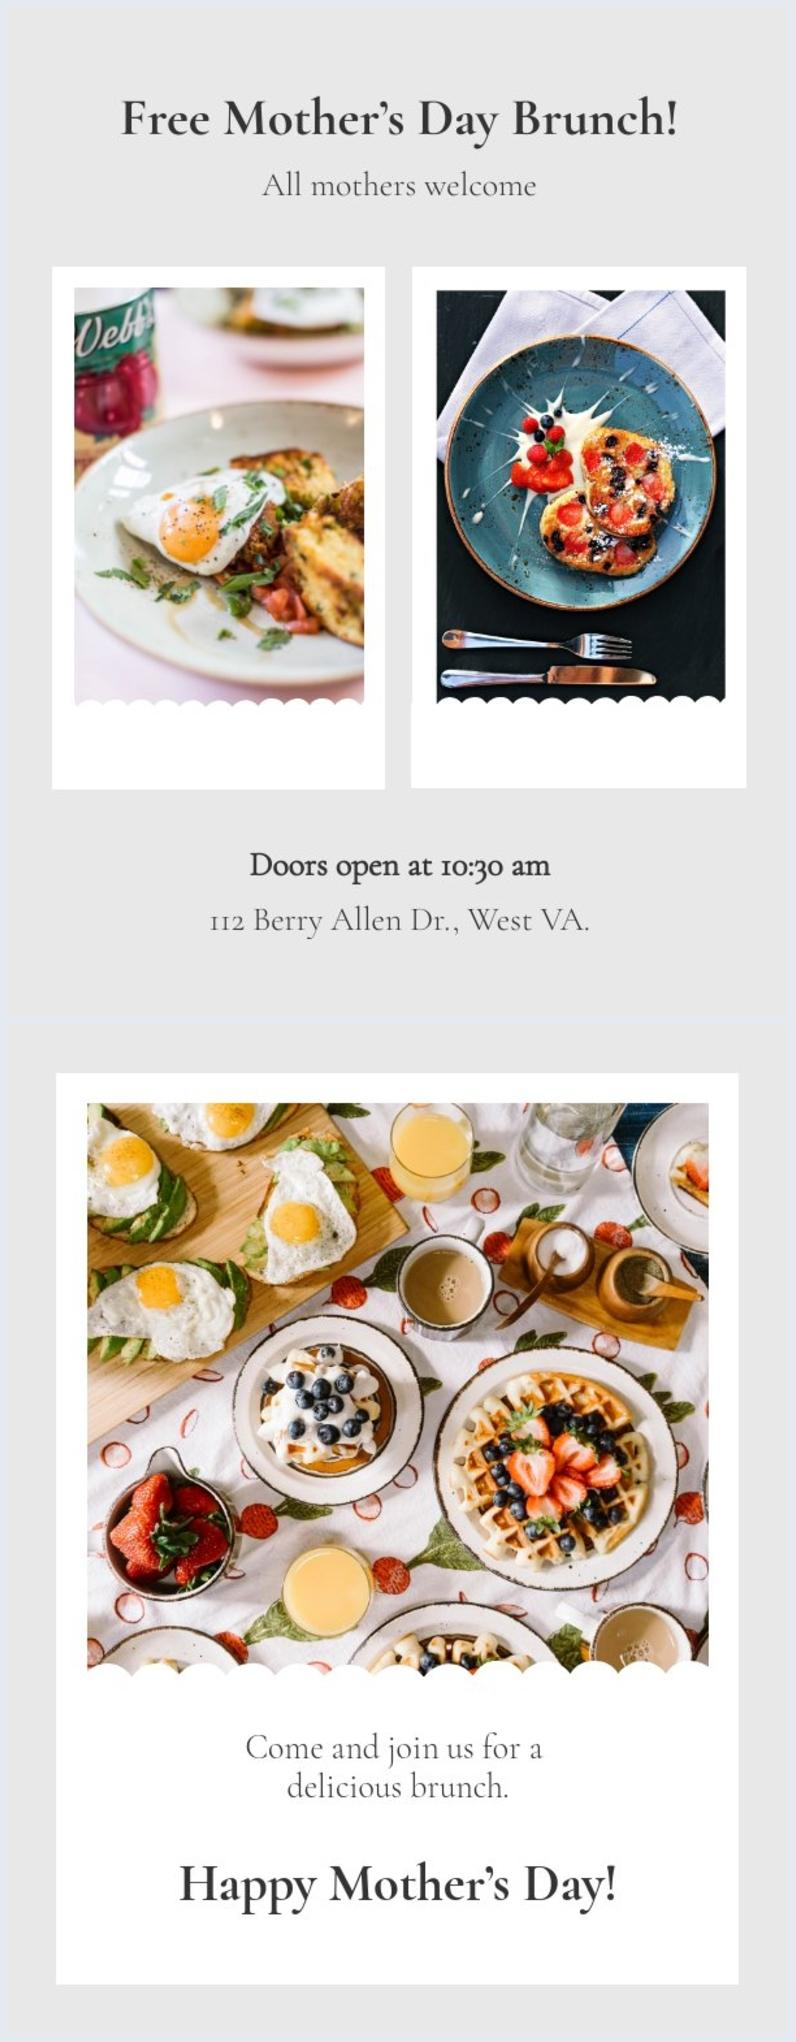 Free Mother's Day brunch invitation design